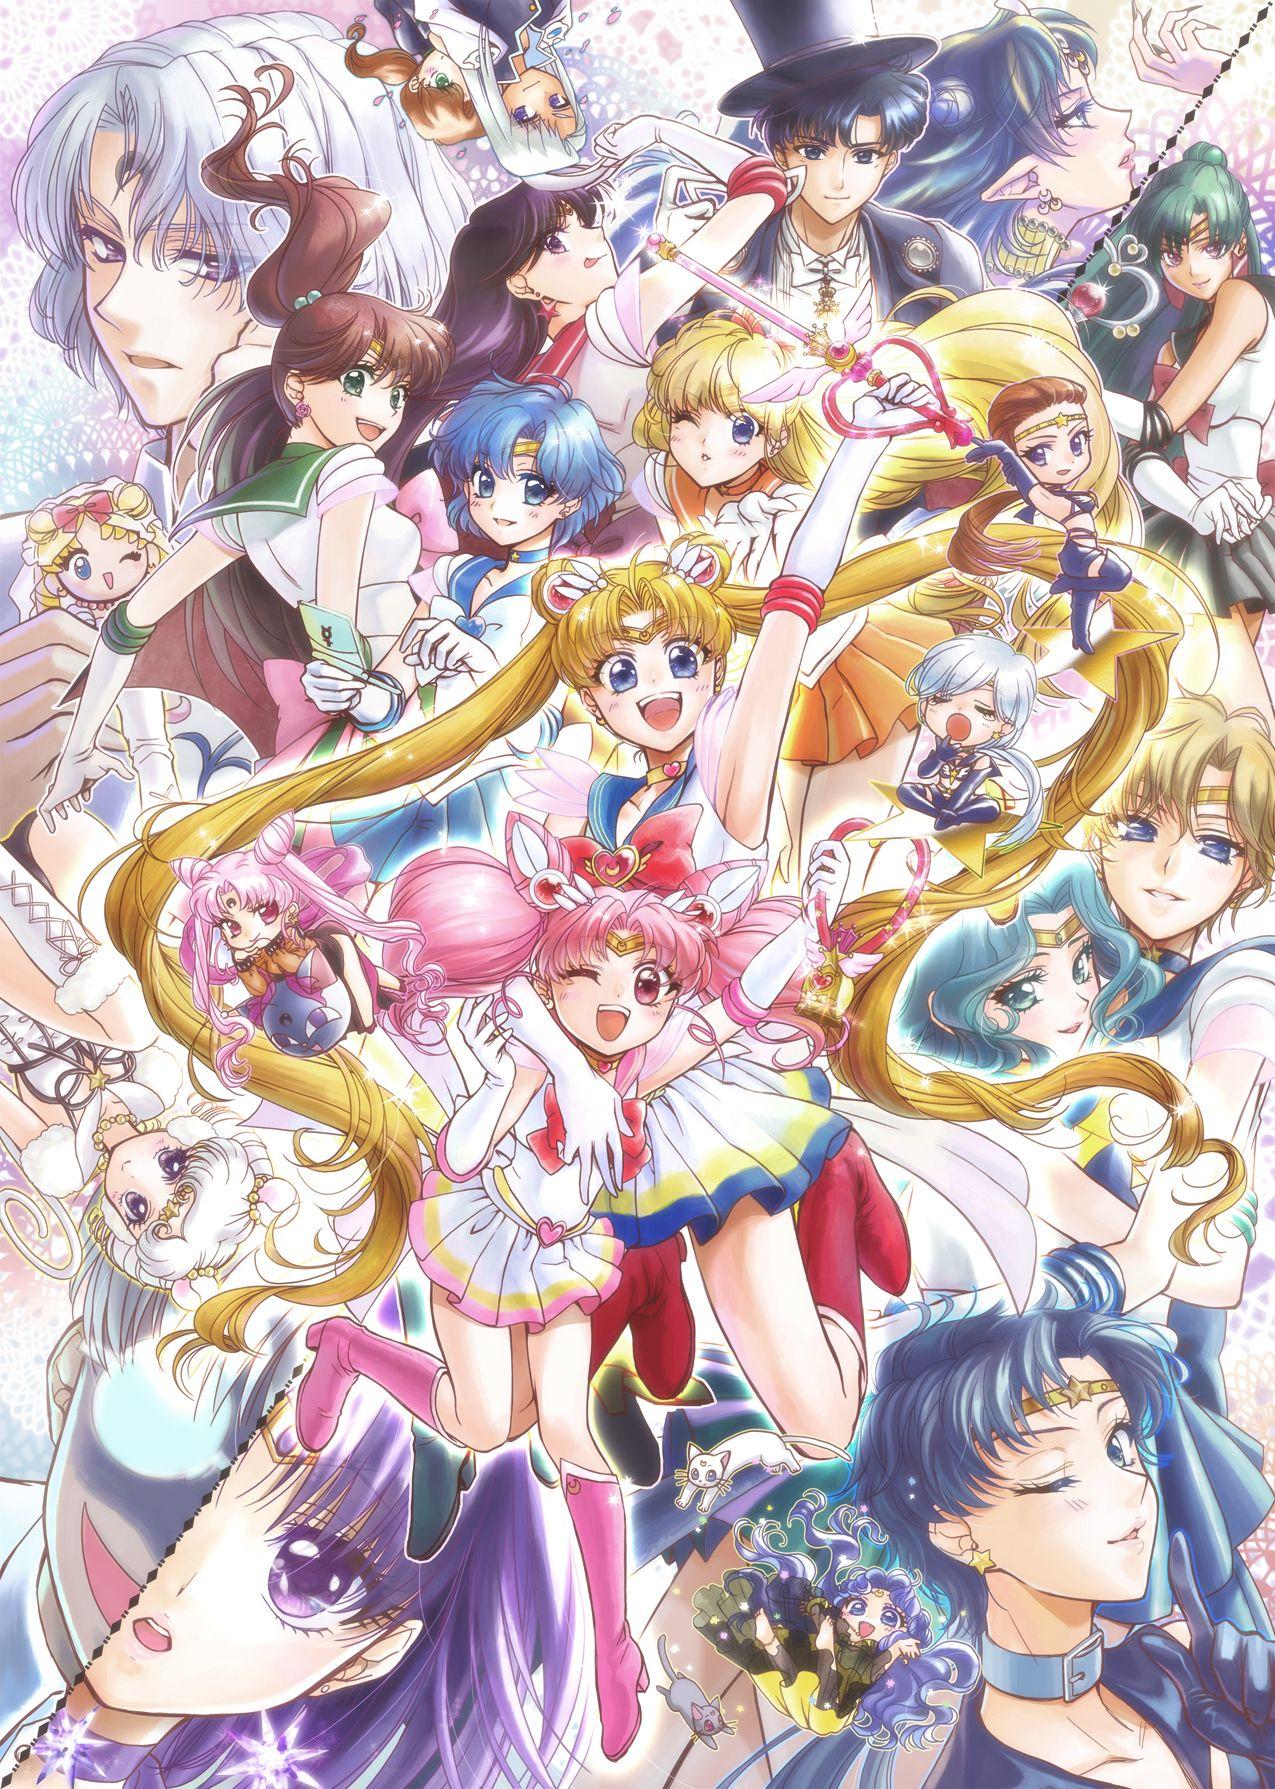 Sailor Moon S Review Sailor moon character, Sailor moon